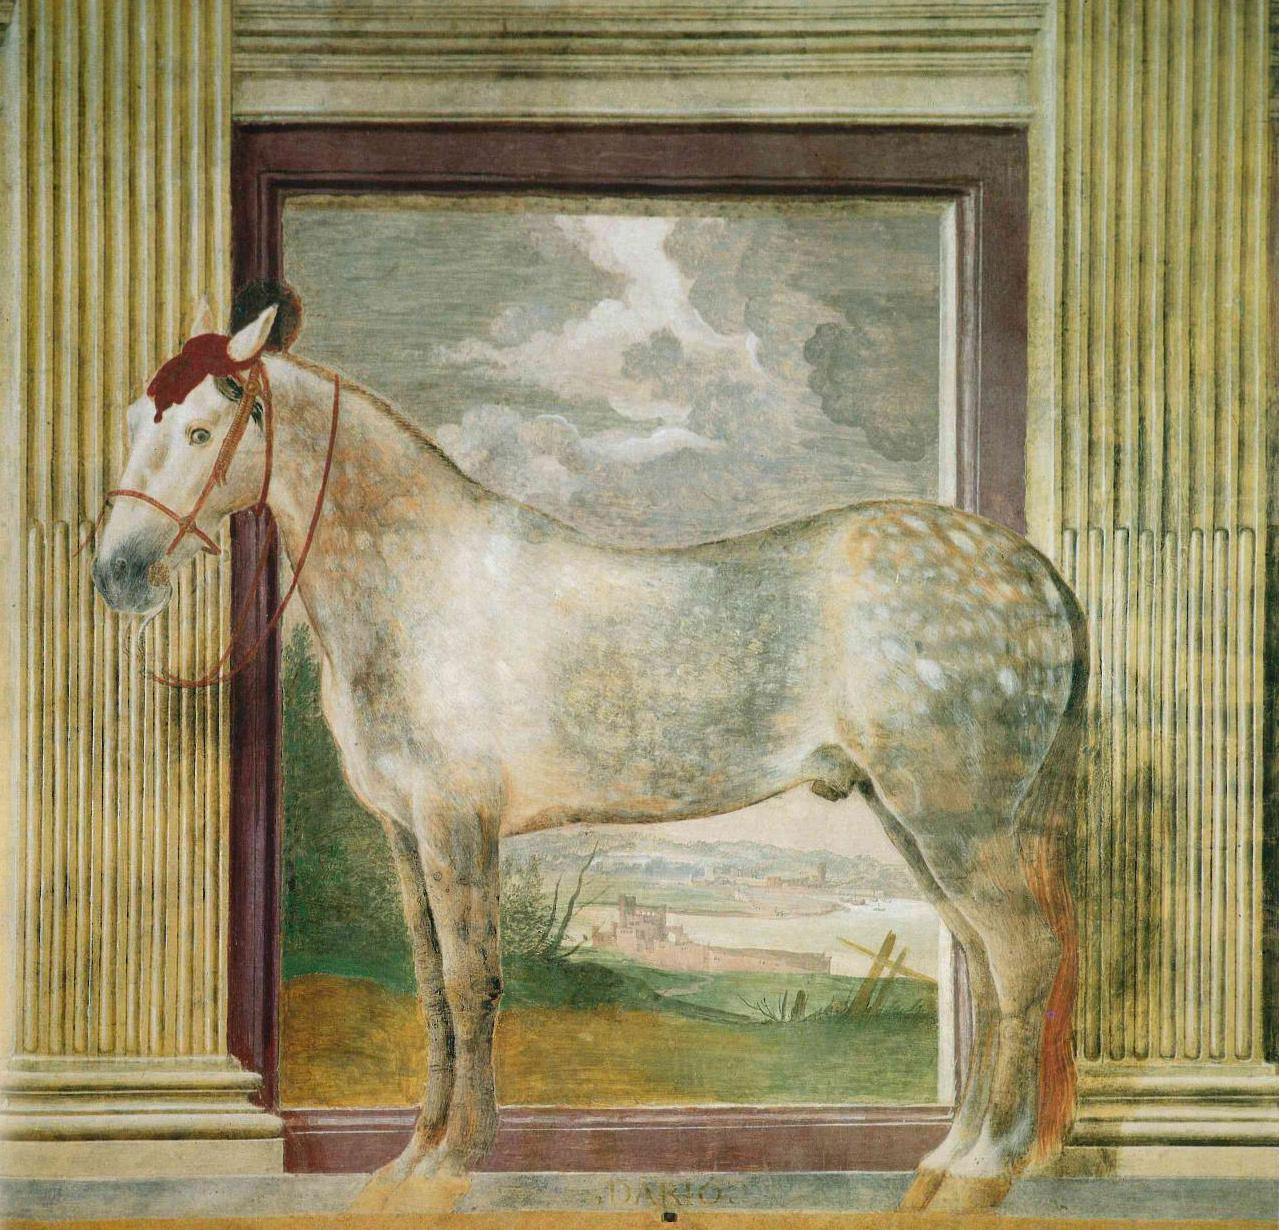 Hallof the Horses - Detail of the North wall Credit - Giulio Romano: une maniere extravagante et moderne, p. 109. Gérard Julien Salvy, Lagune, Paris 1994.